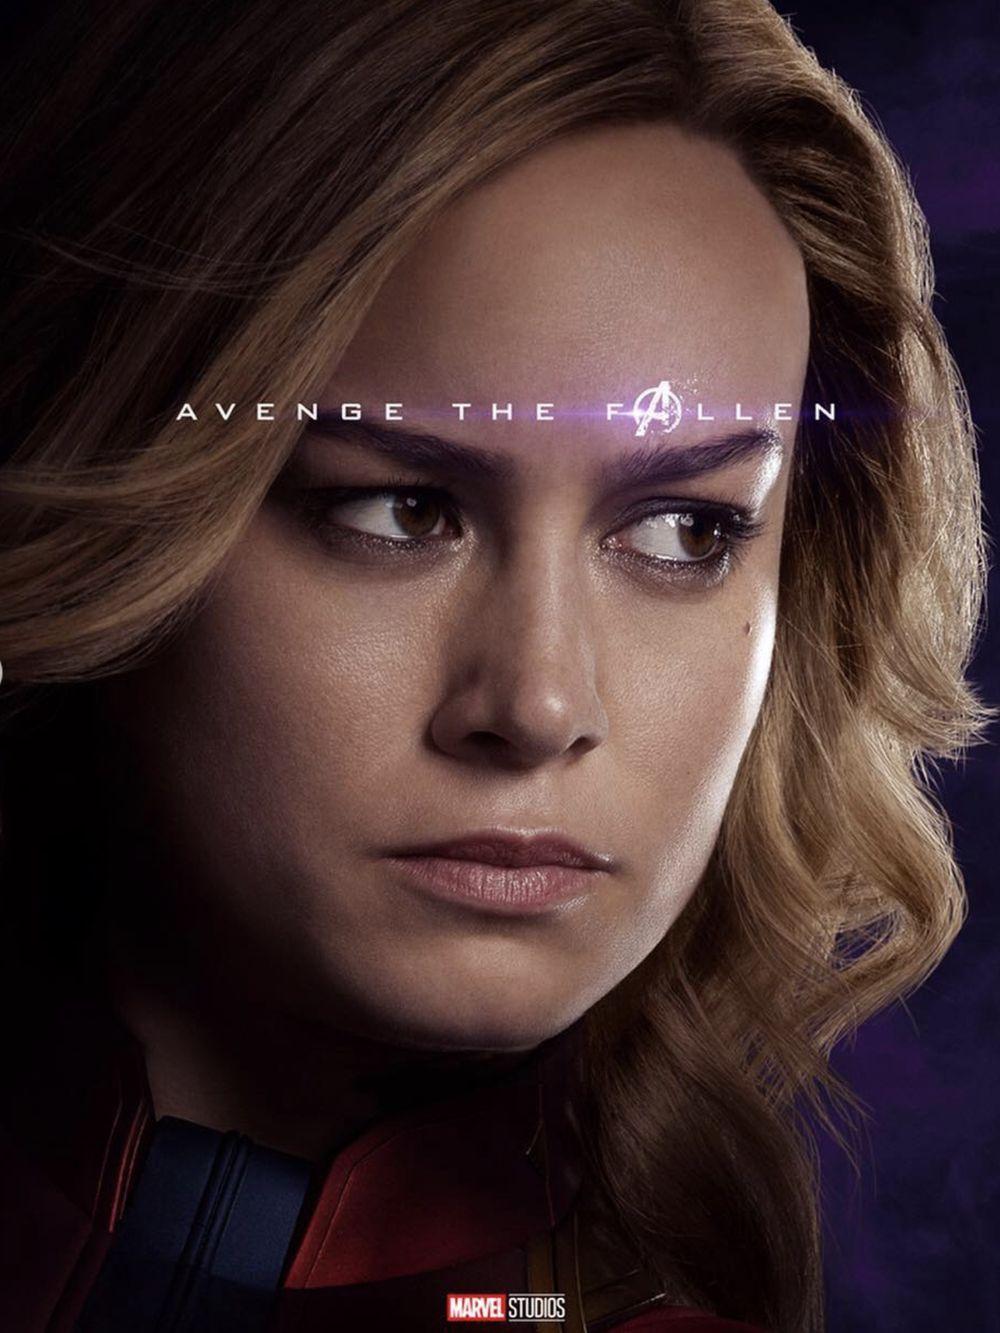 Poster Captain Marvel. Marvel Studios merilis poster karakter-karakter Avengers: Endgame. Poster itu menampilkan para pahlawan baik yang bertahan maupun yang gugur dalam film sebelumnya, Avengers: Infinity War. (dok. Disney)